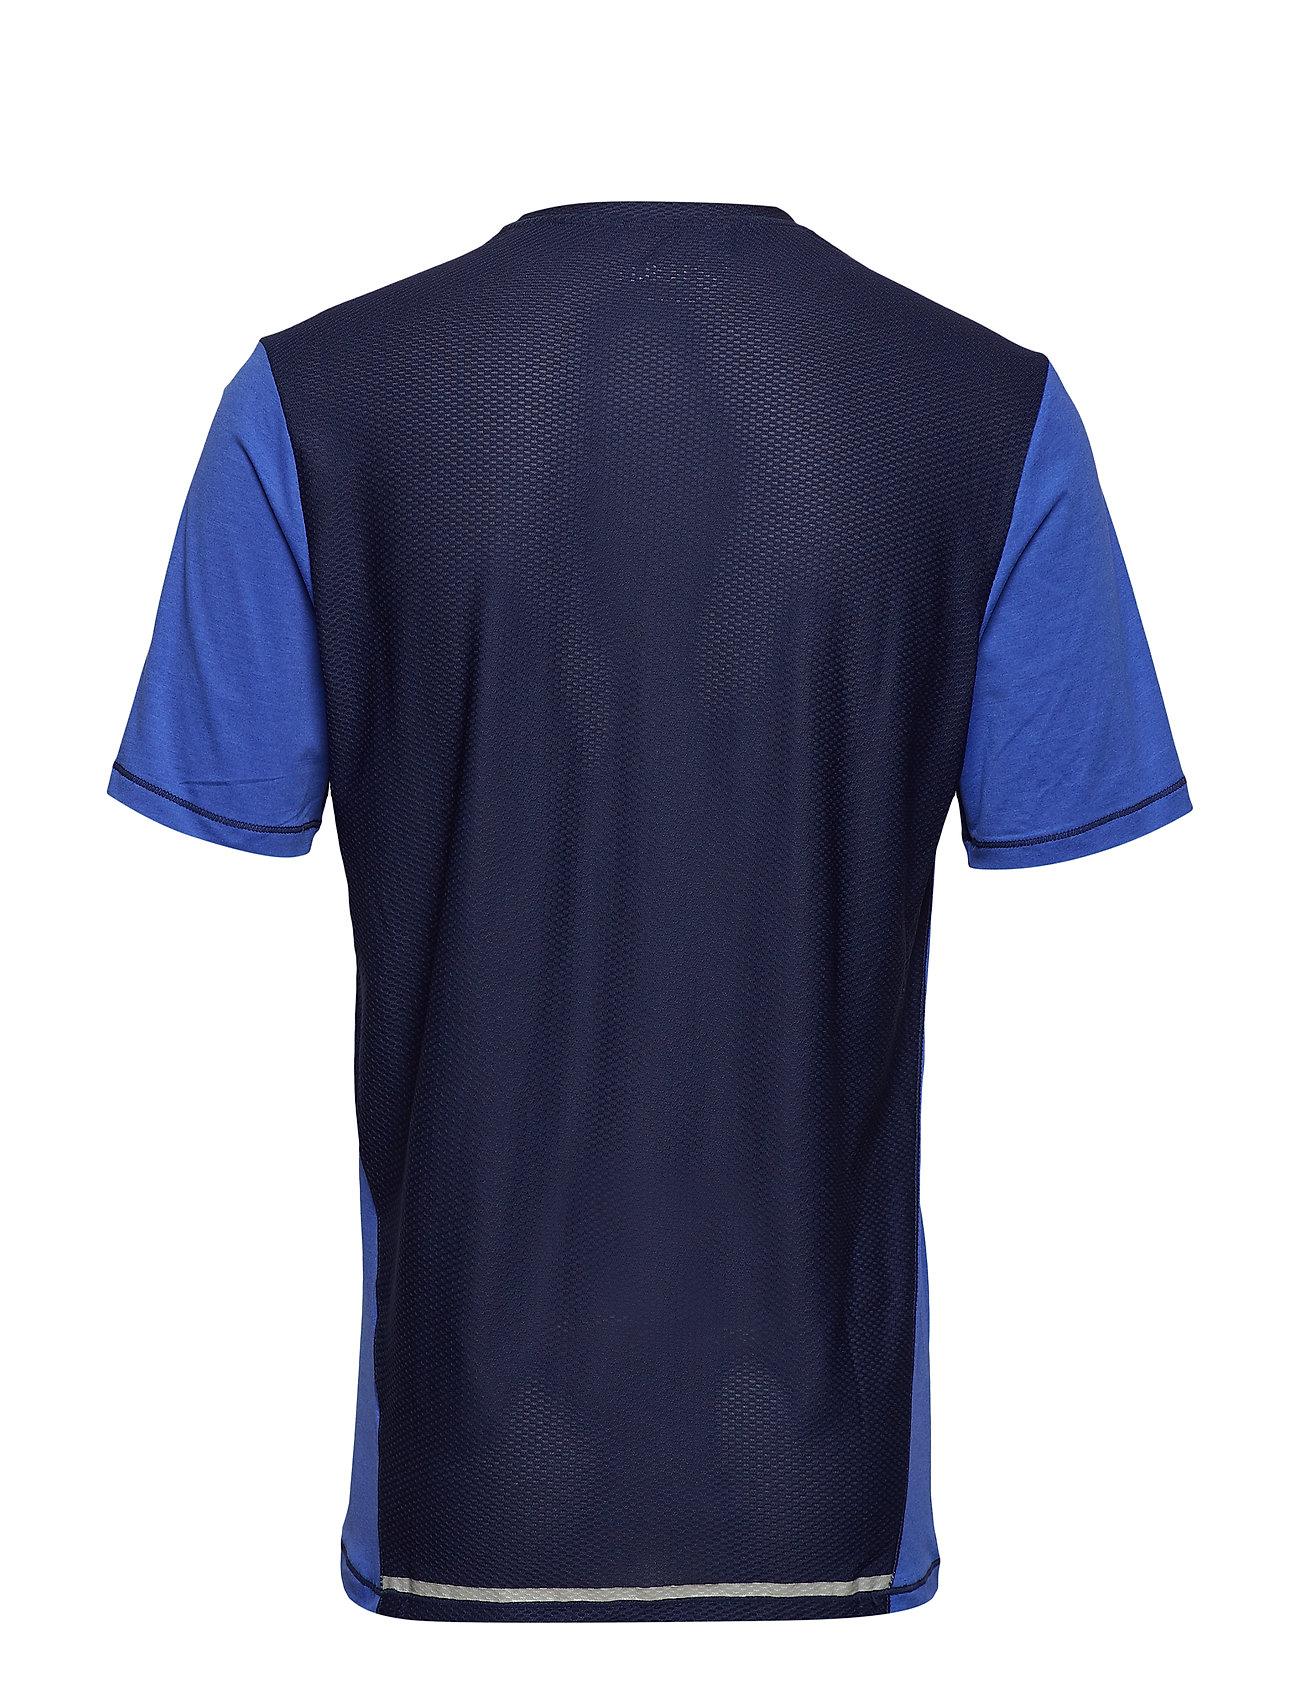 Juha T shirtpower MelangeHalti M Blue wOnk0P